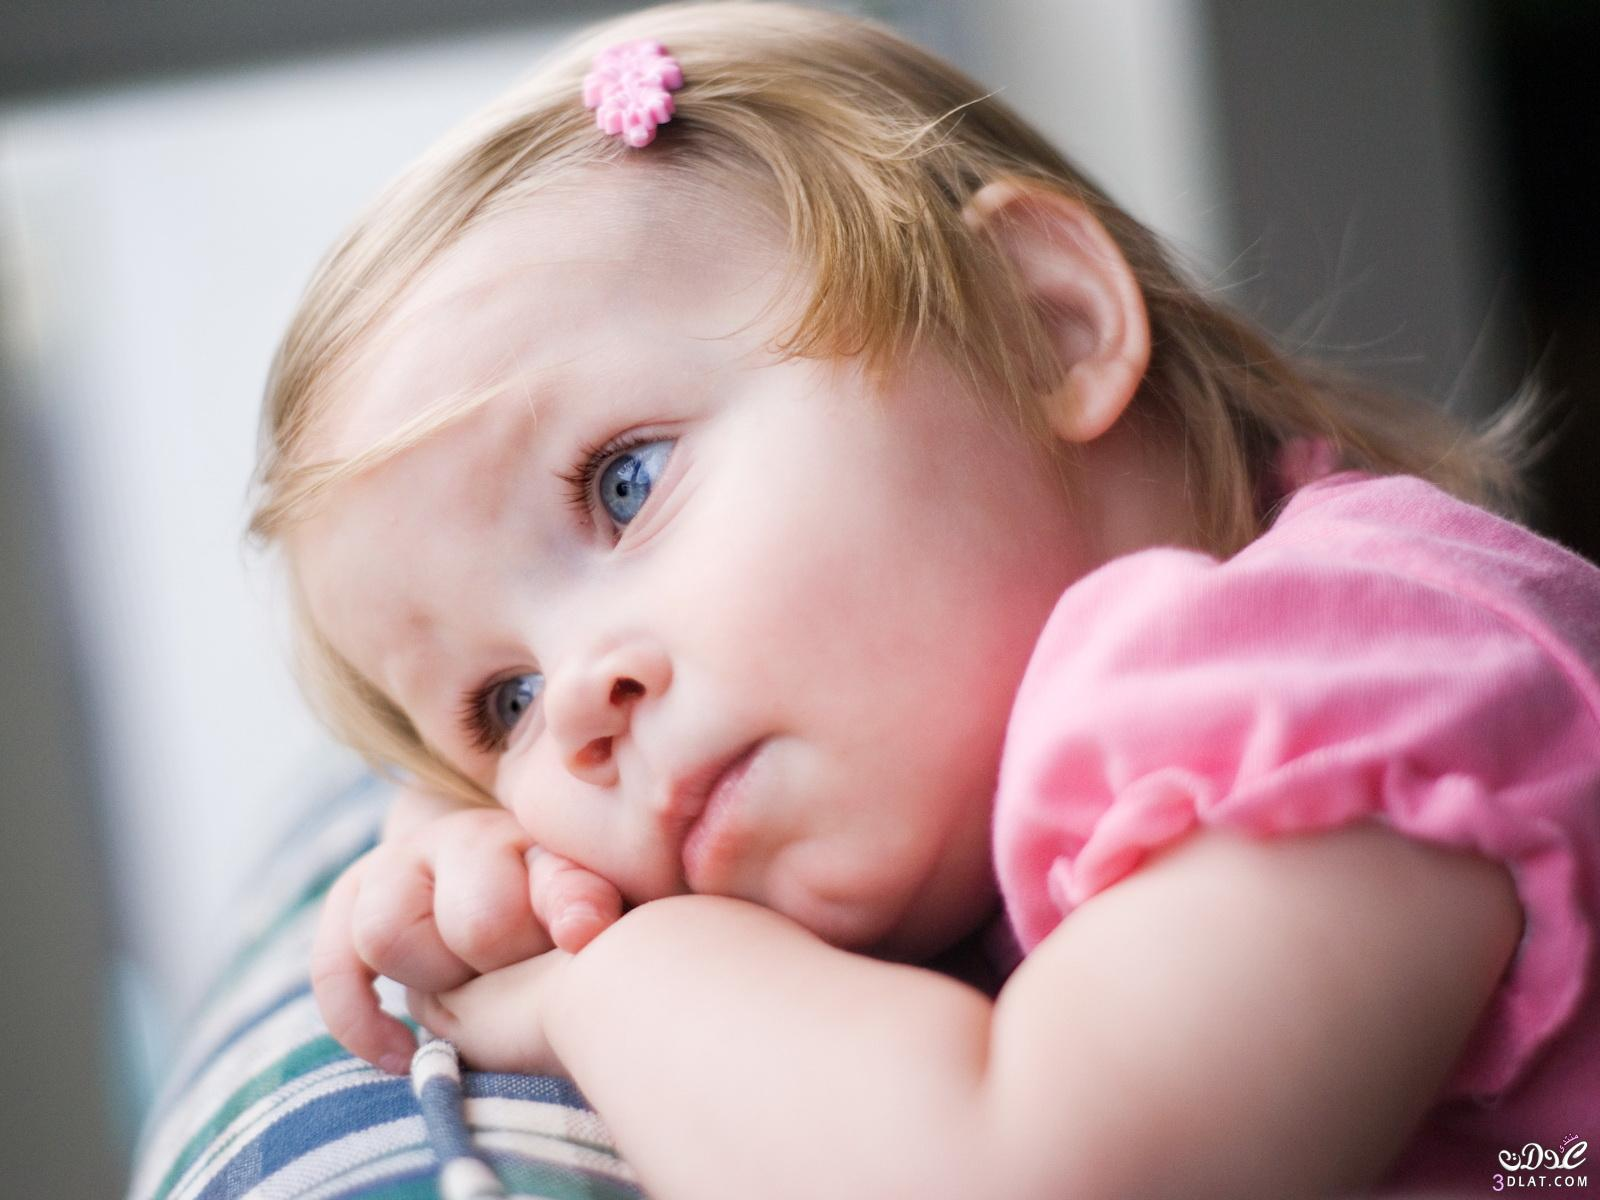 صور اطفال صور بيبي صور اولاد صور حلوين اطفال حلوينصور اطفال صغار2020 70